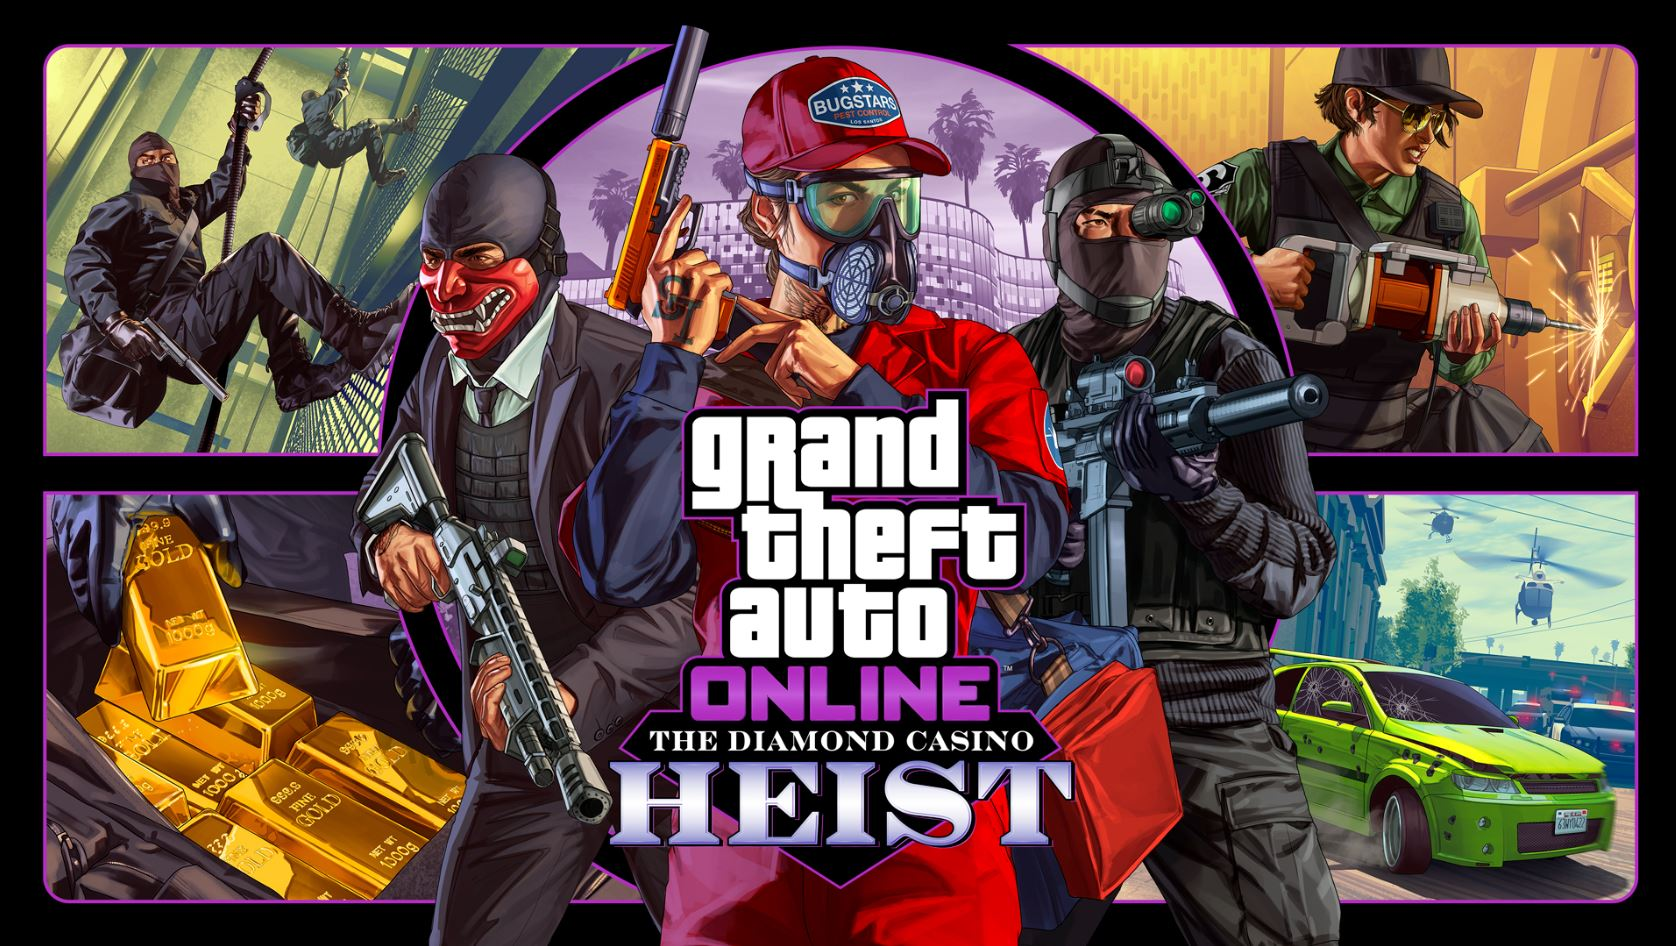 Gta Online How To Start The Diamond Casino Heist New Arcade Property Cost Vg247